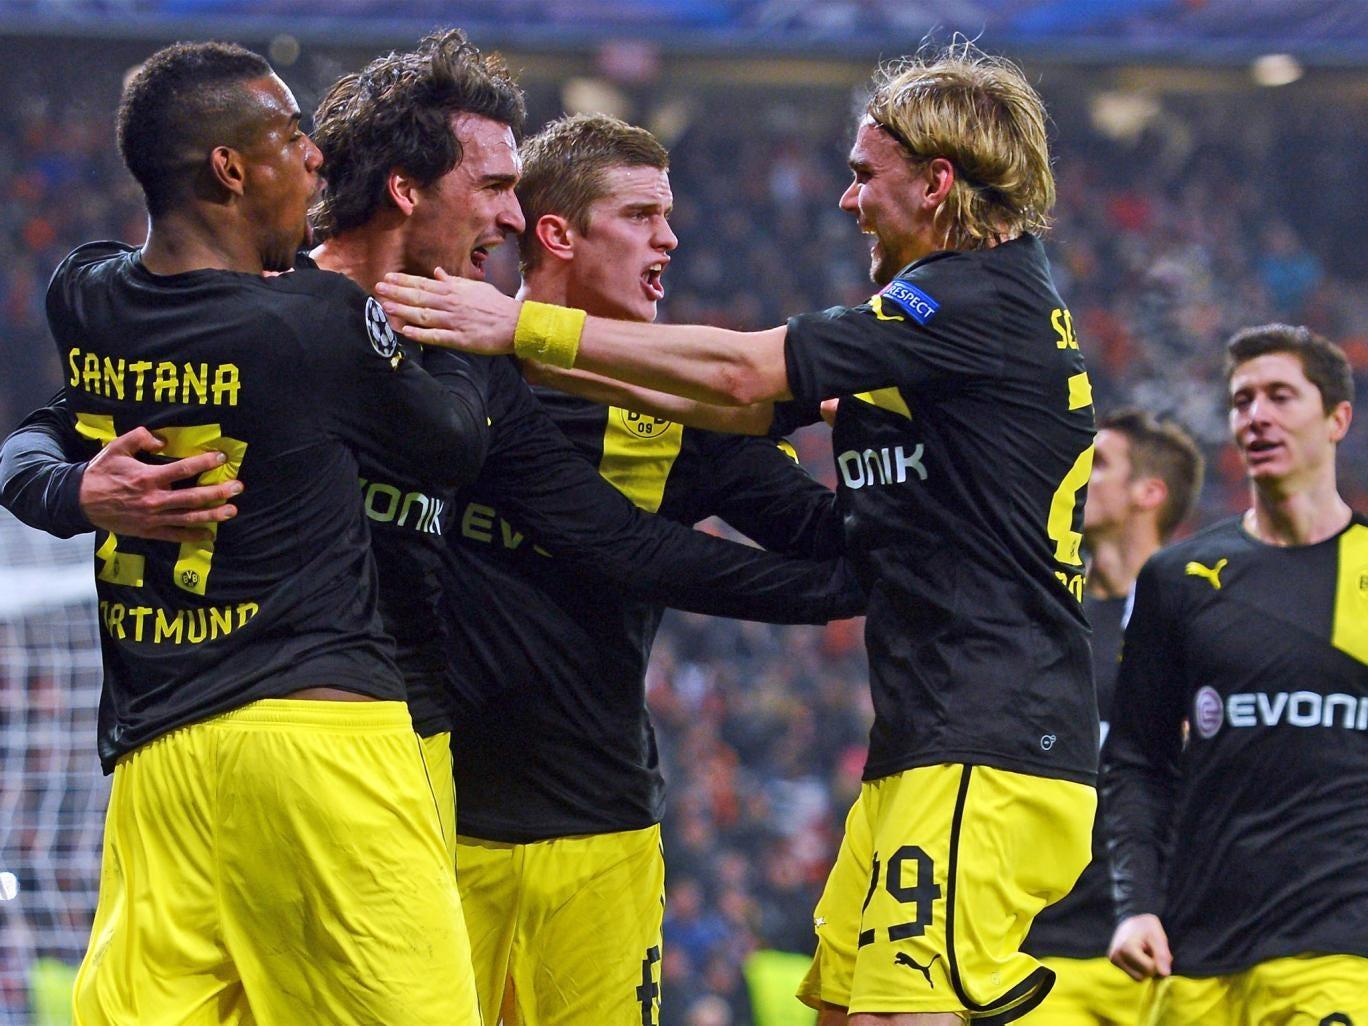 Dortmund's Mats Hummels celebrates with his teammates